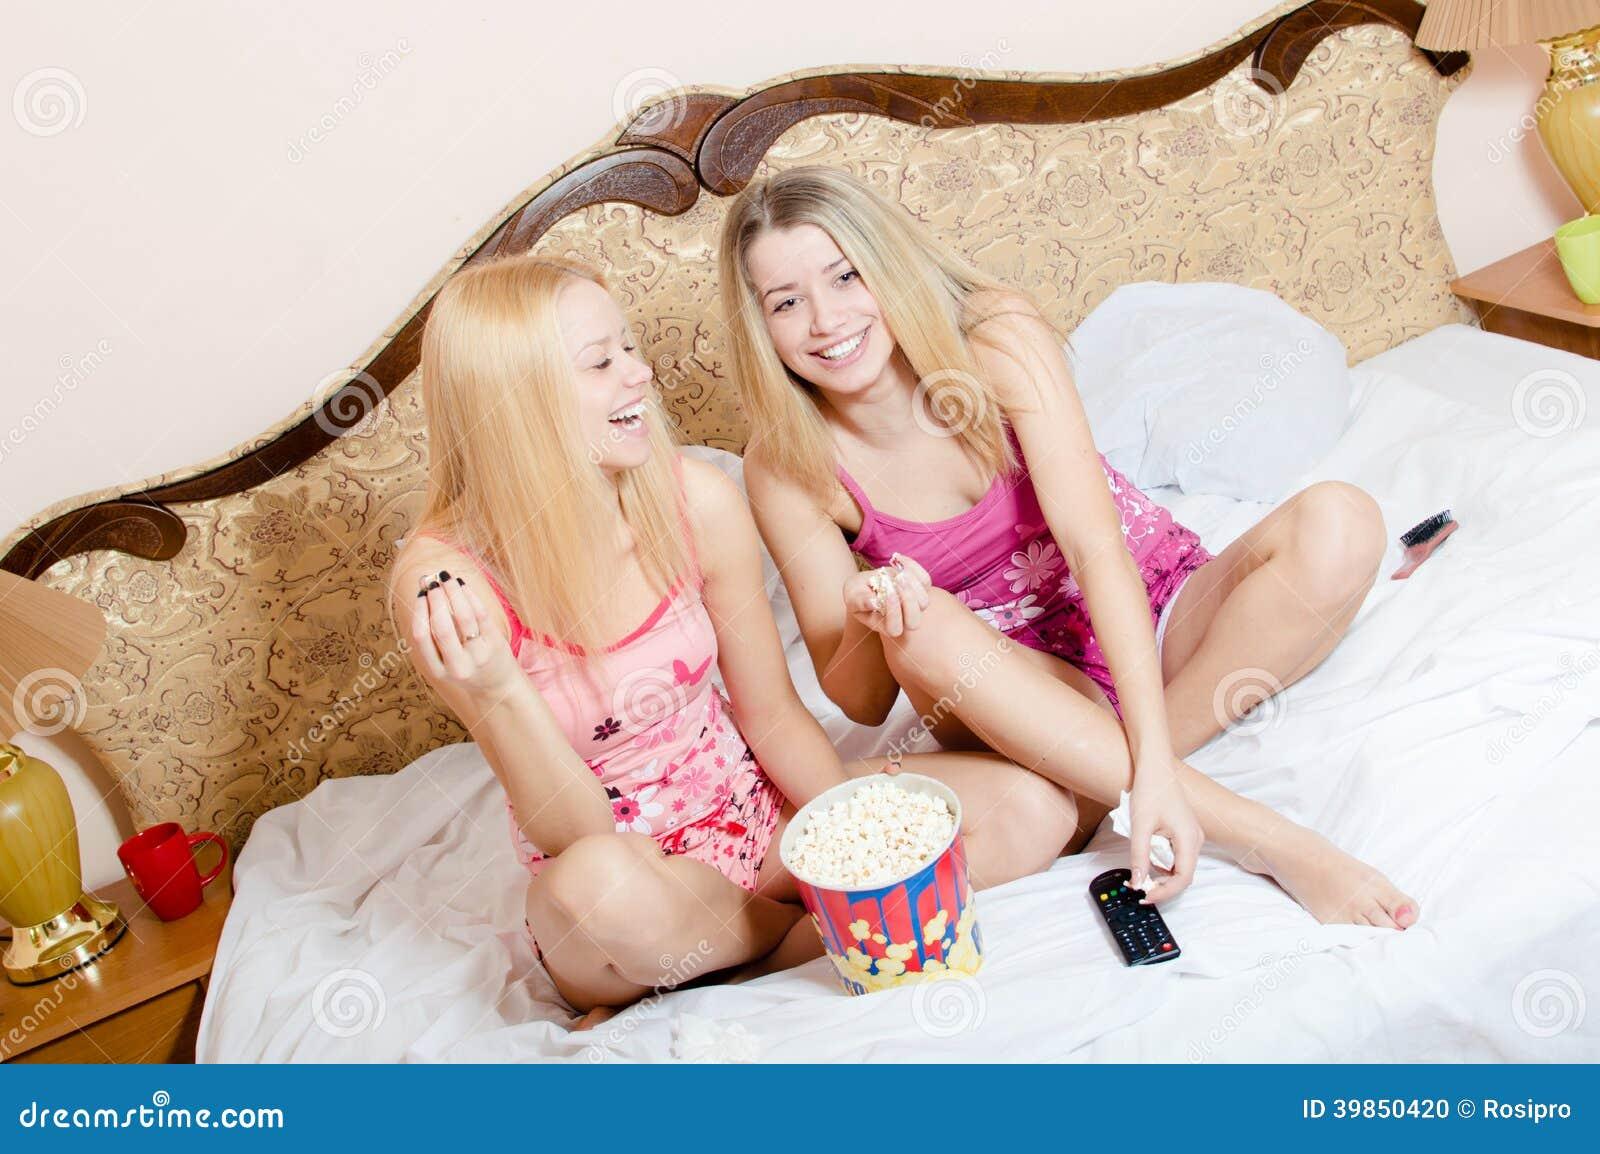 Download phim lesbian gp